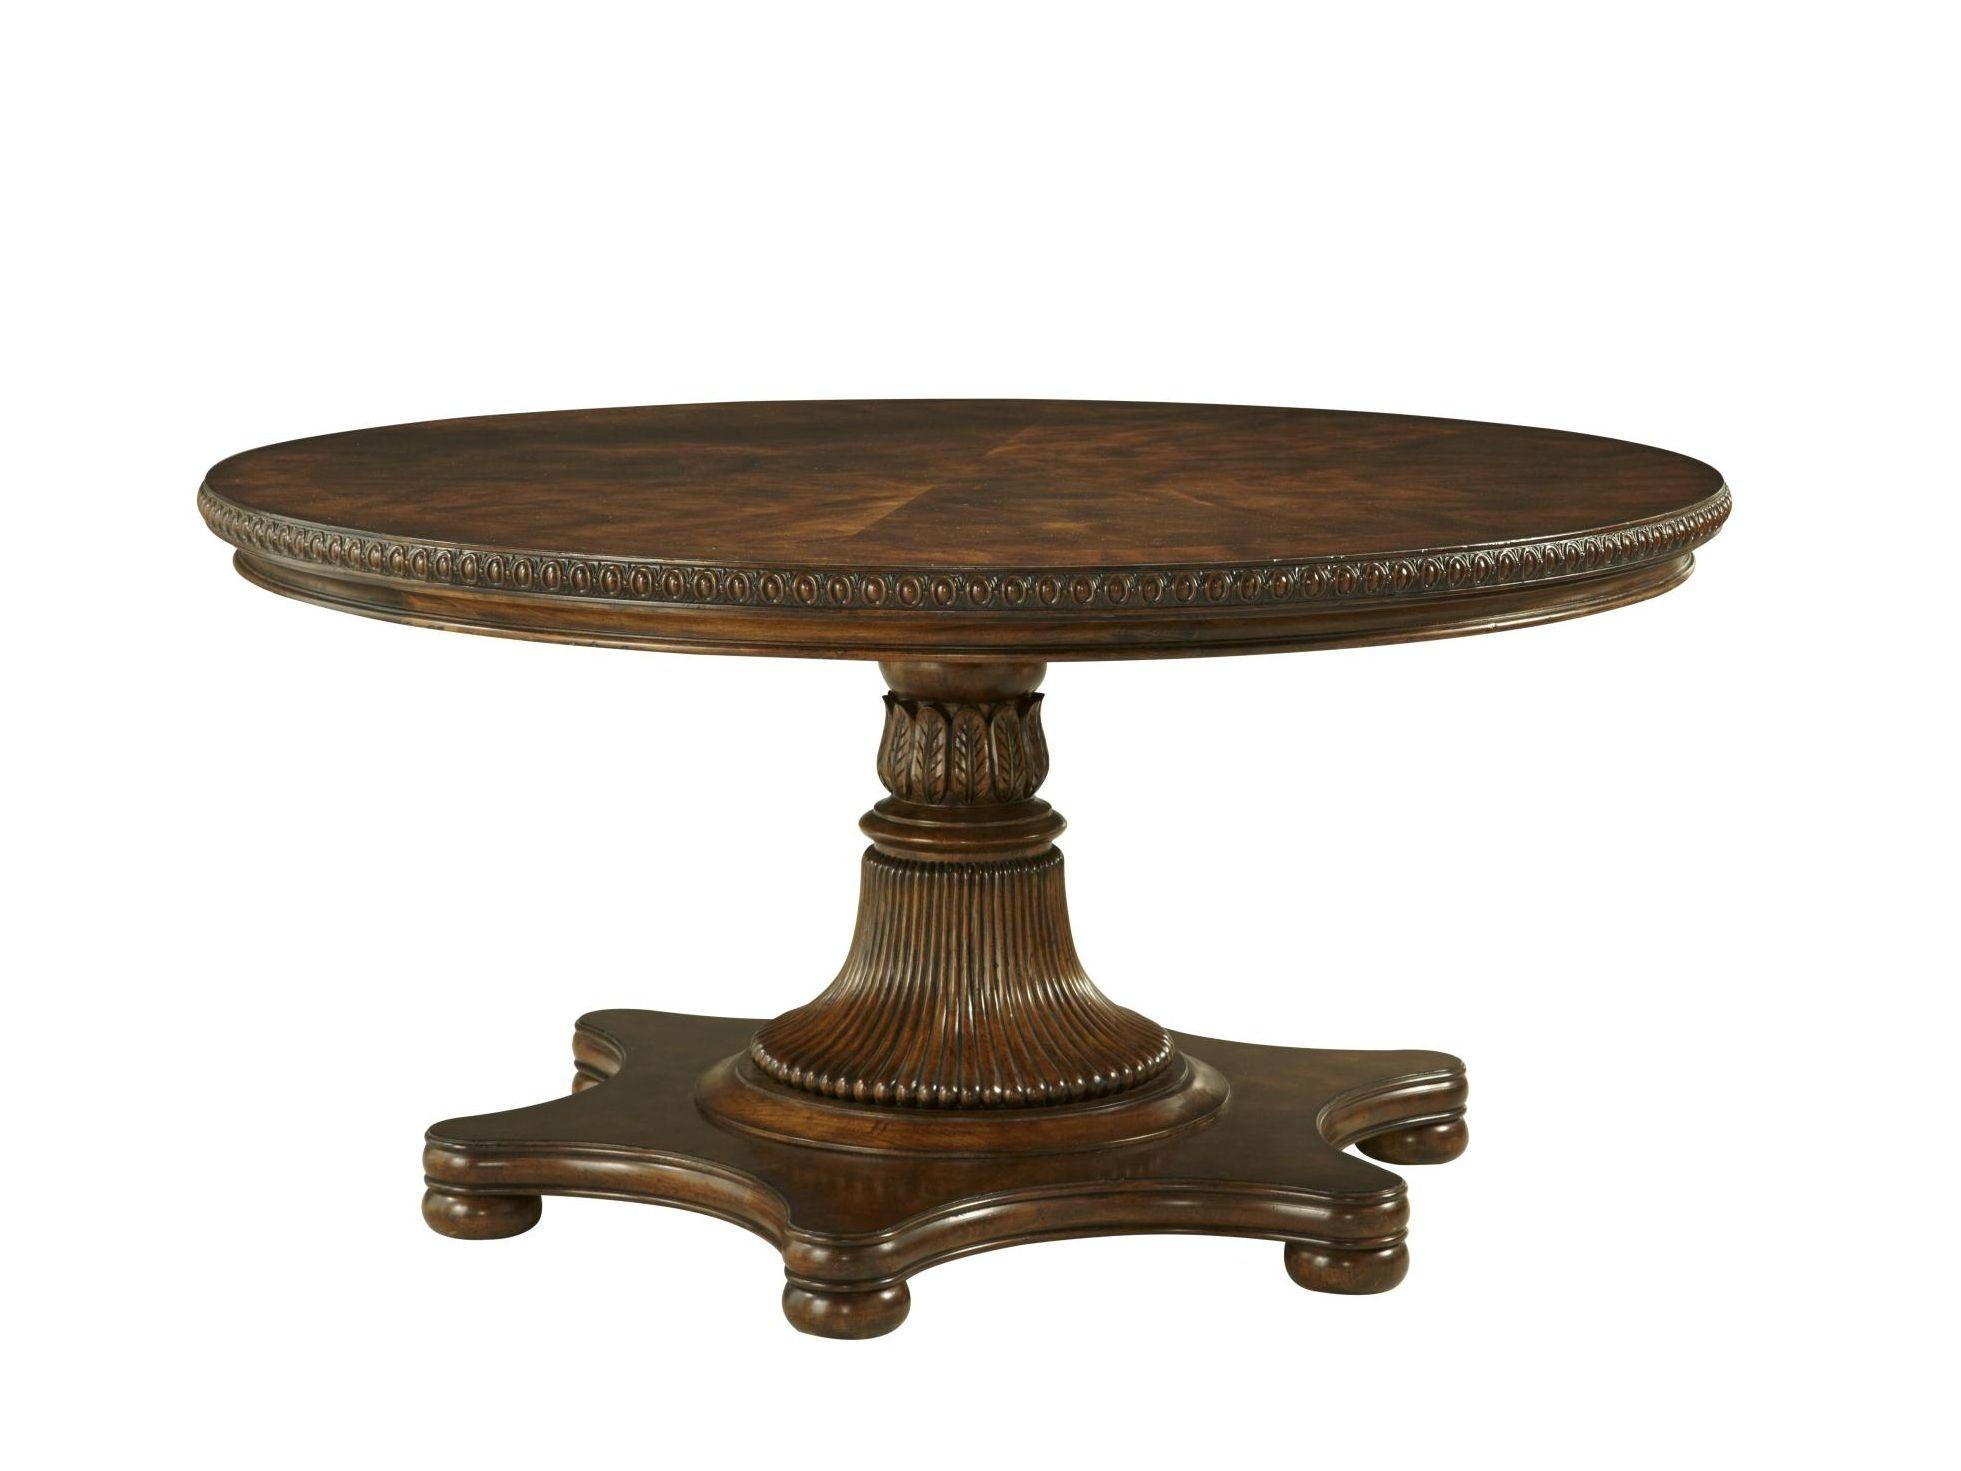 fine furniture design dining room balustrade round dining table 1344